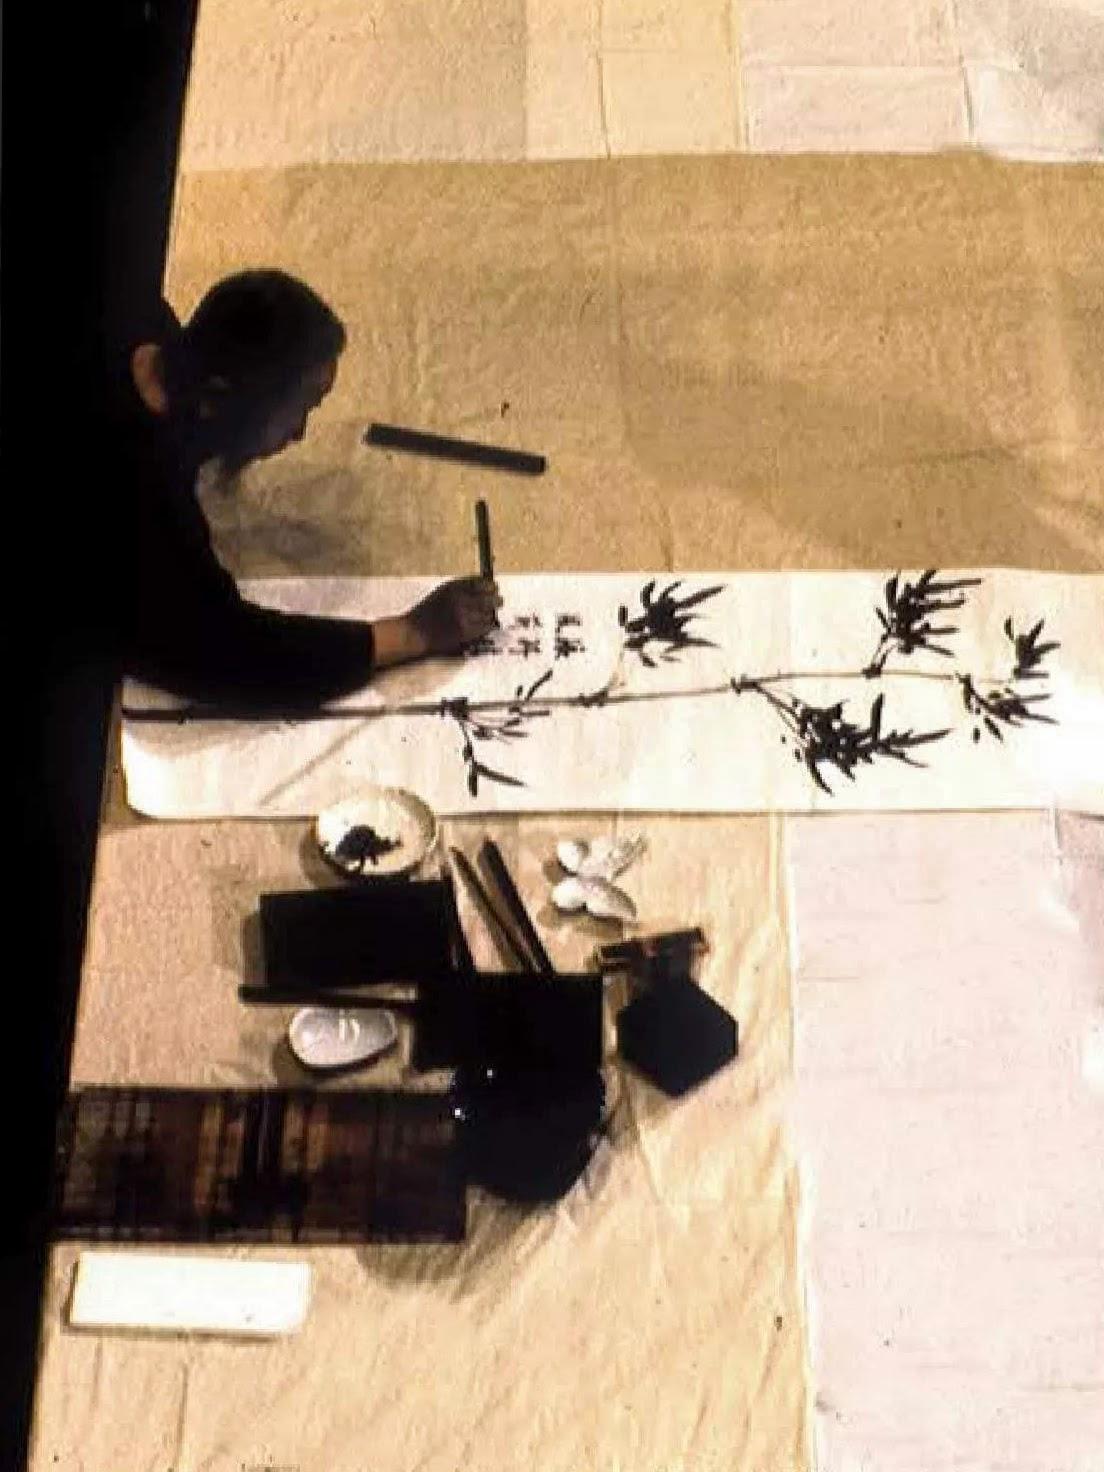 Le pinceau de Cheng Man Ching